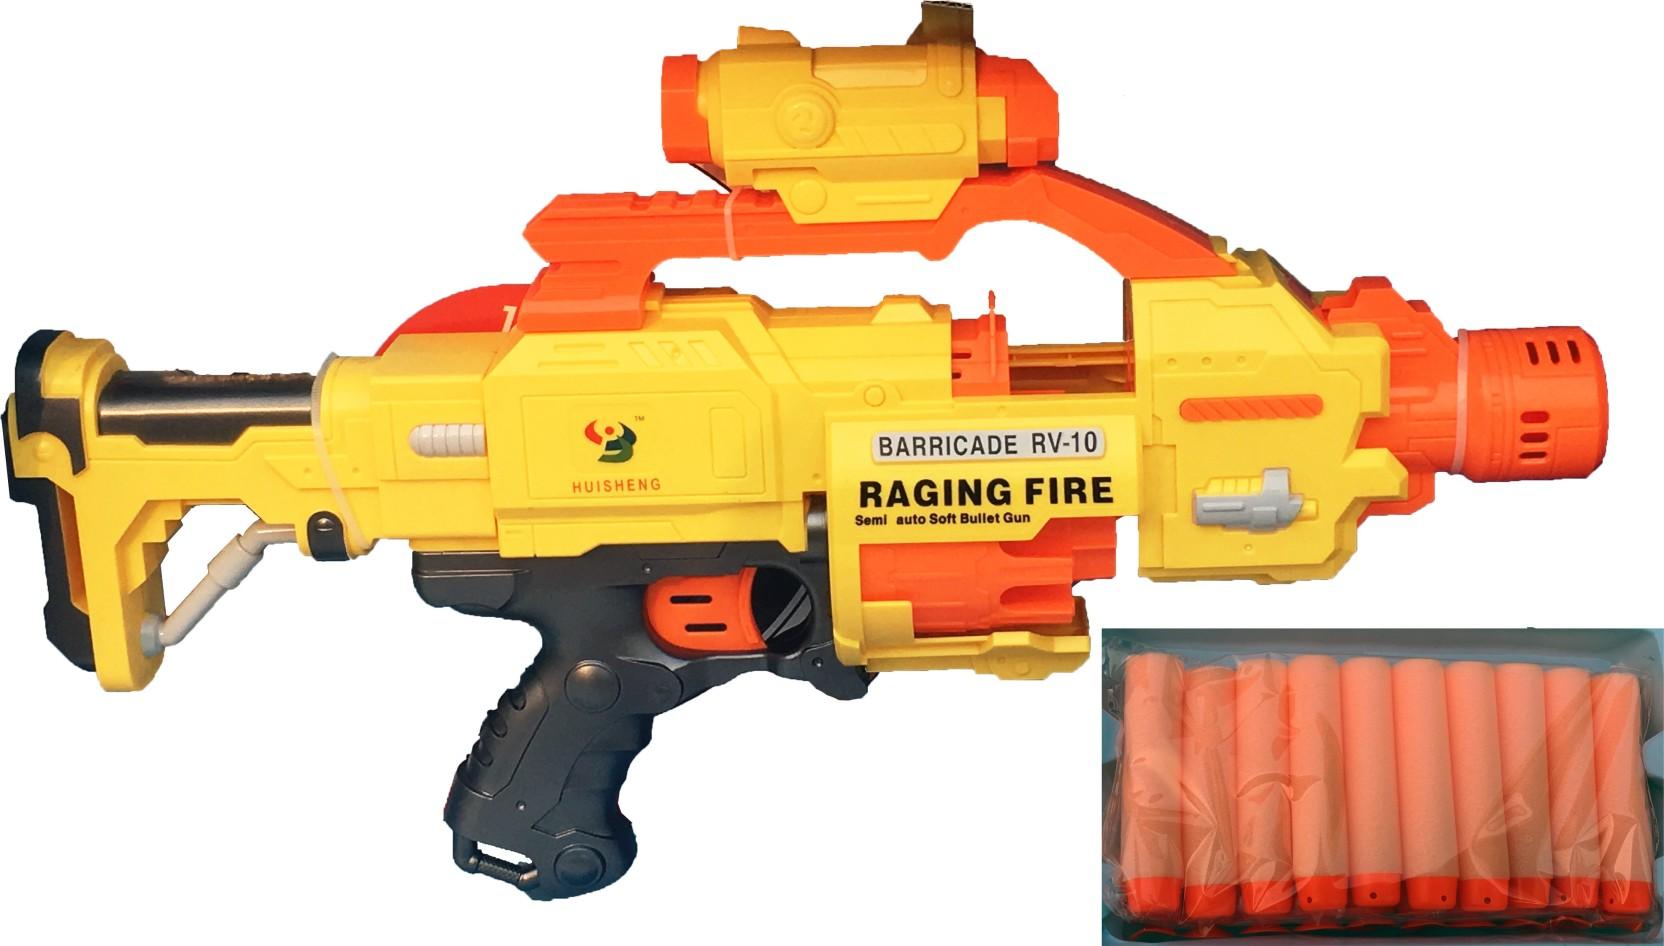 Imported Raging Fire Semi Auto Soft Bullet Gun Multicolor Big Diwali Sale Ends In18 Hrs 29 Mins 40 Secs